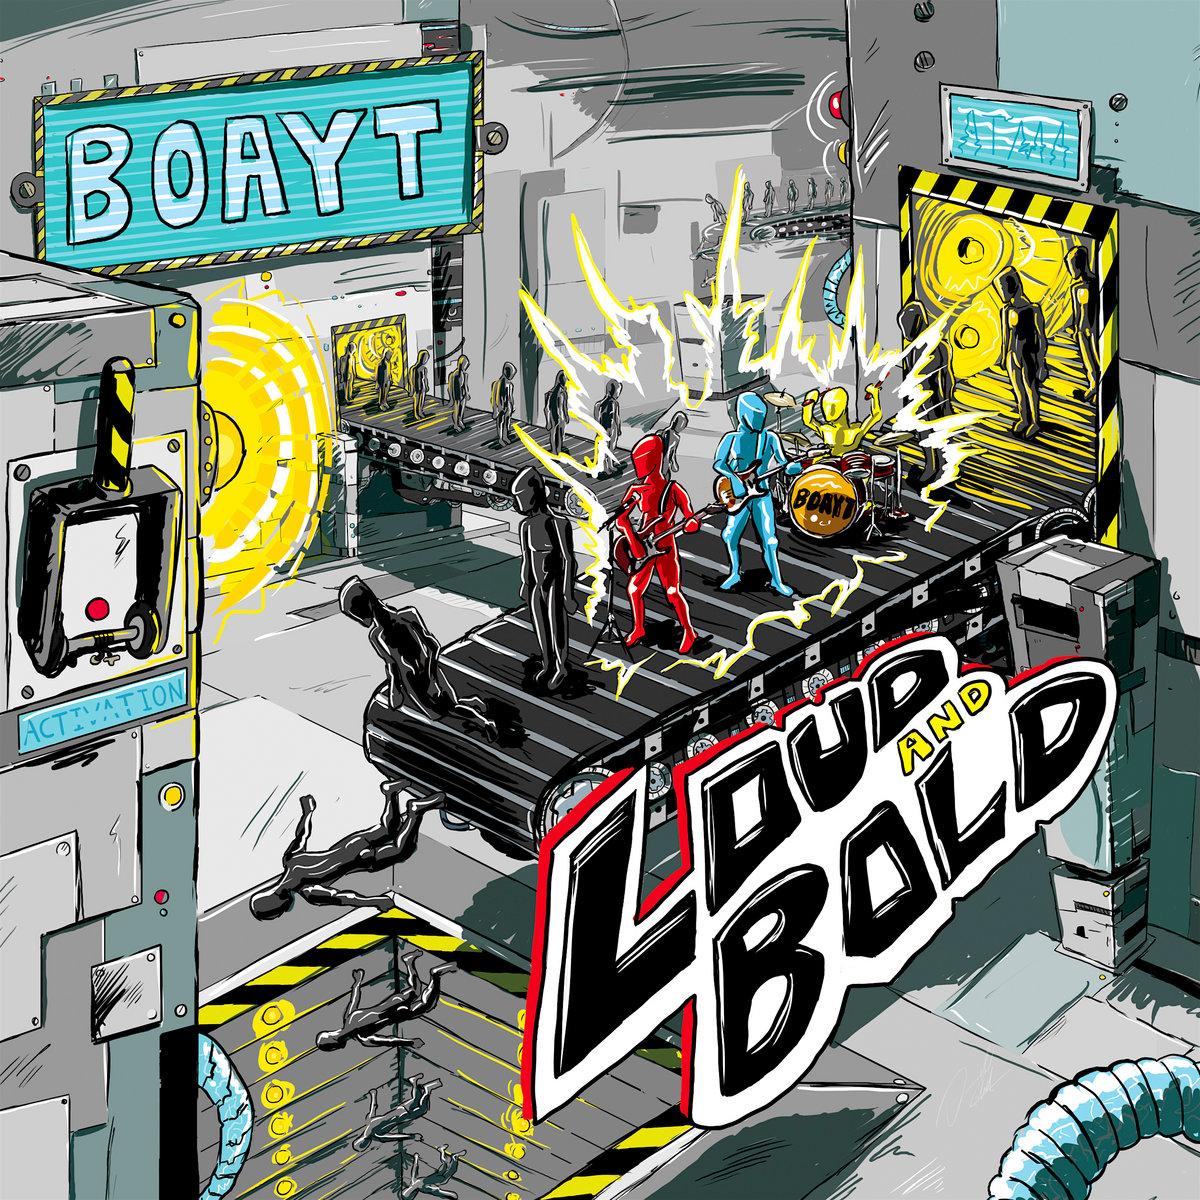 BOAYT